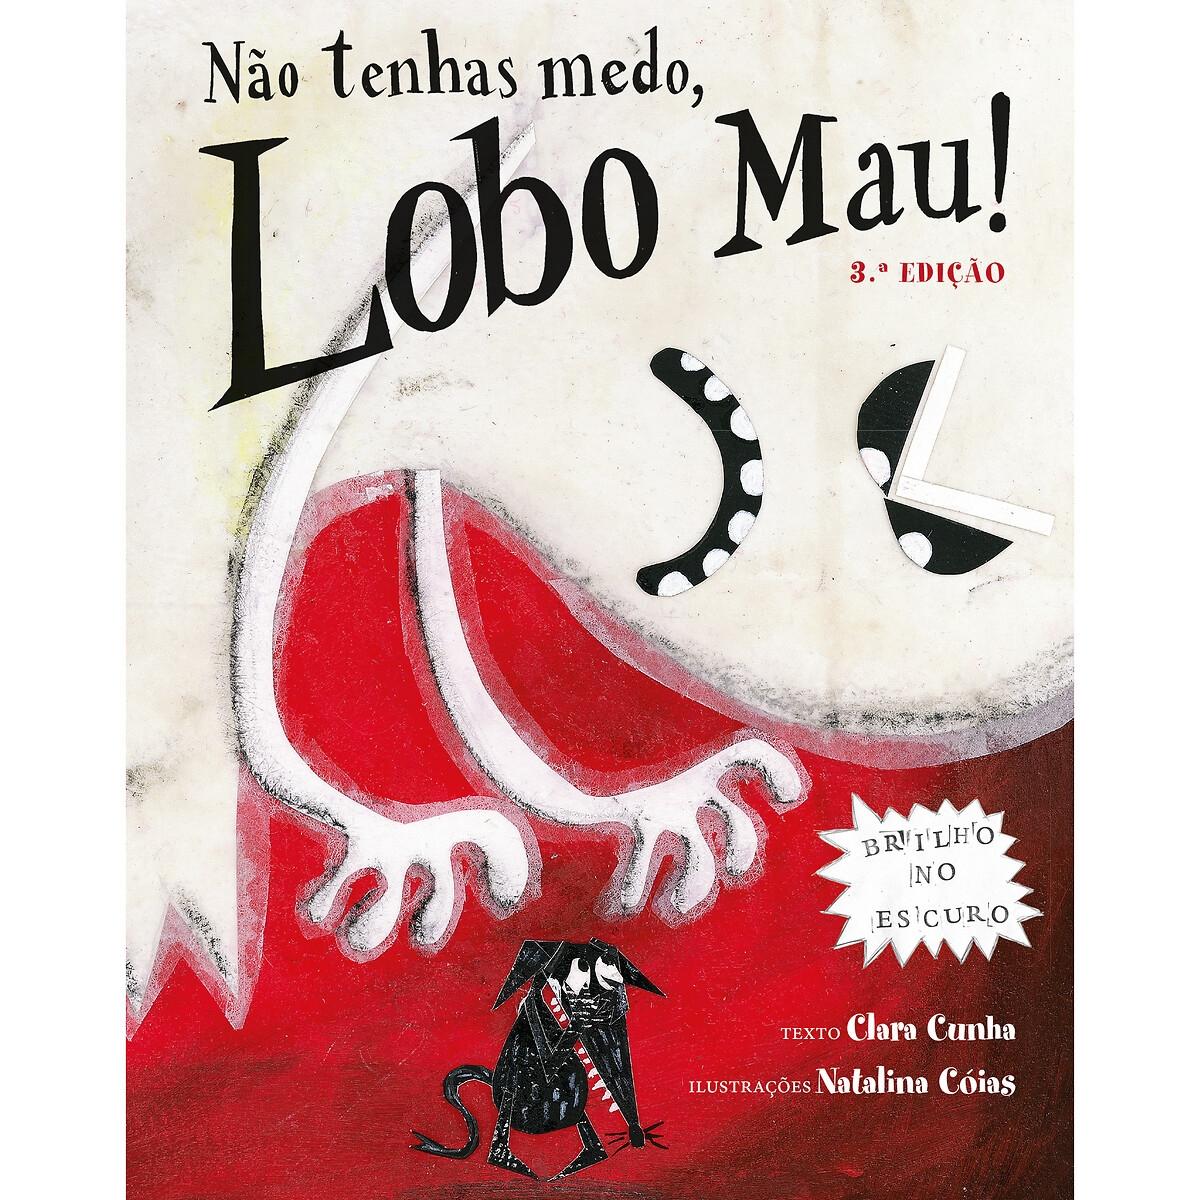 LIVROS HORIZONTE - Livros Horizonte Livro Não tenhas medo, Lobo Mau!